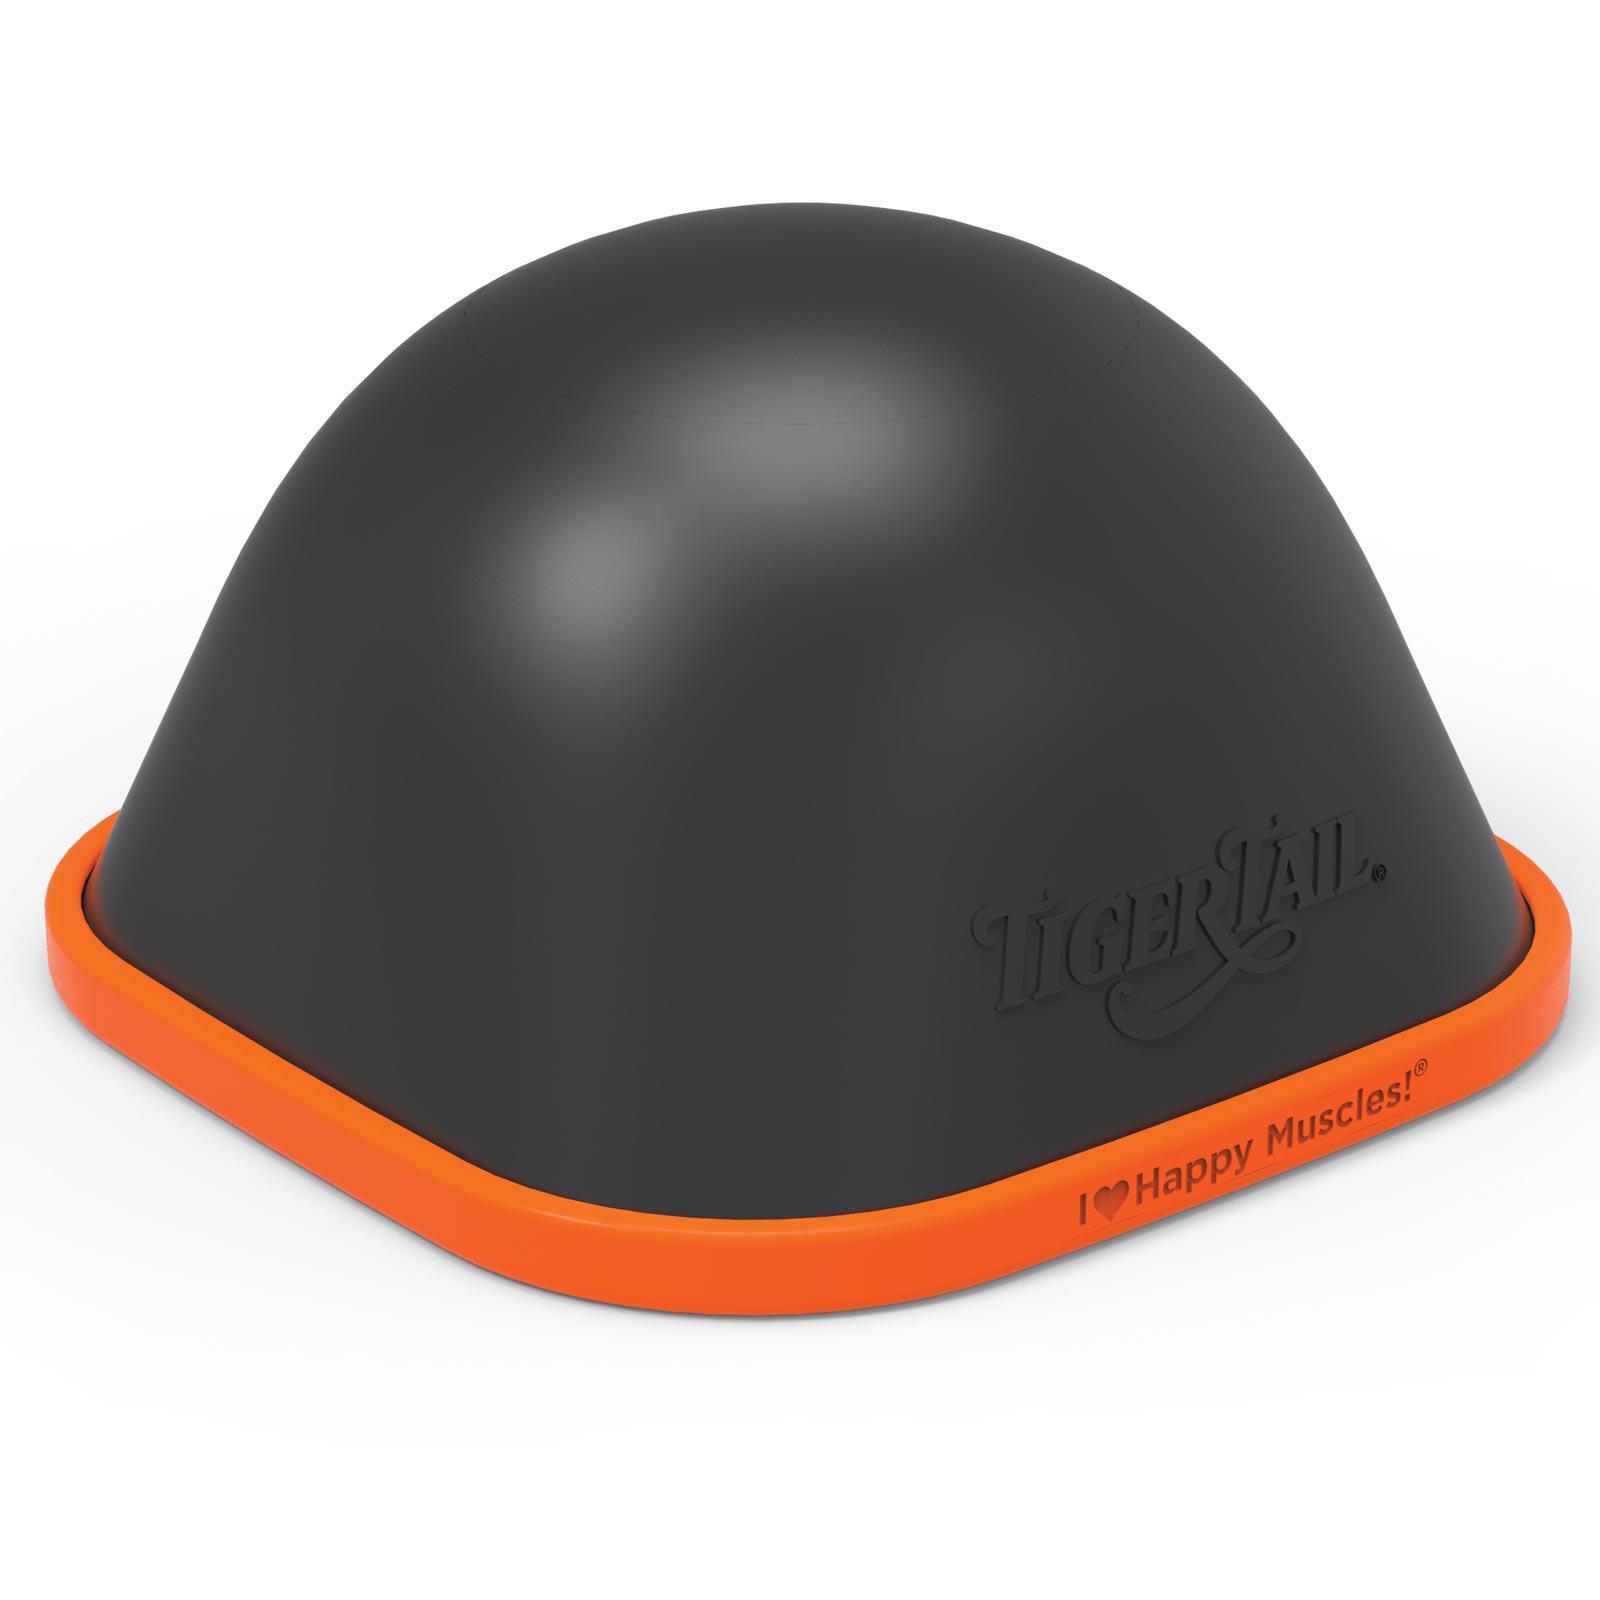 Tiger Tail Unisex The Big One Foam Roller Black Orange Sports Physio Gym Soccer